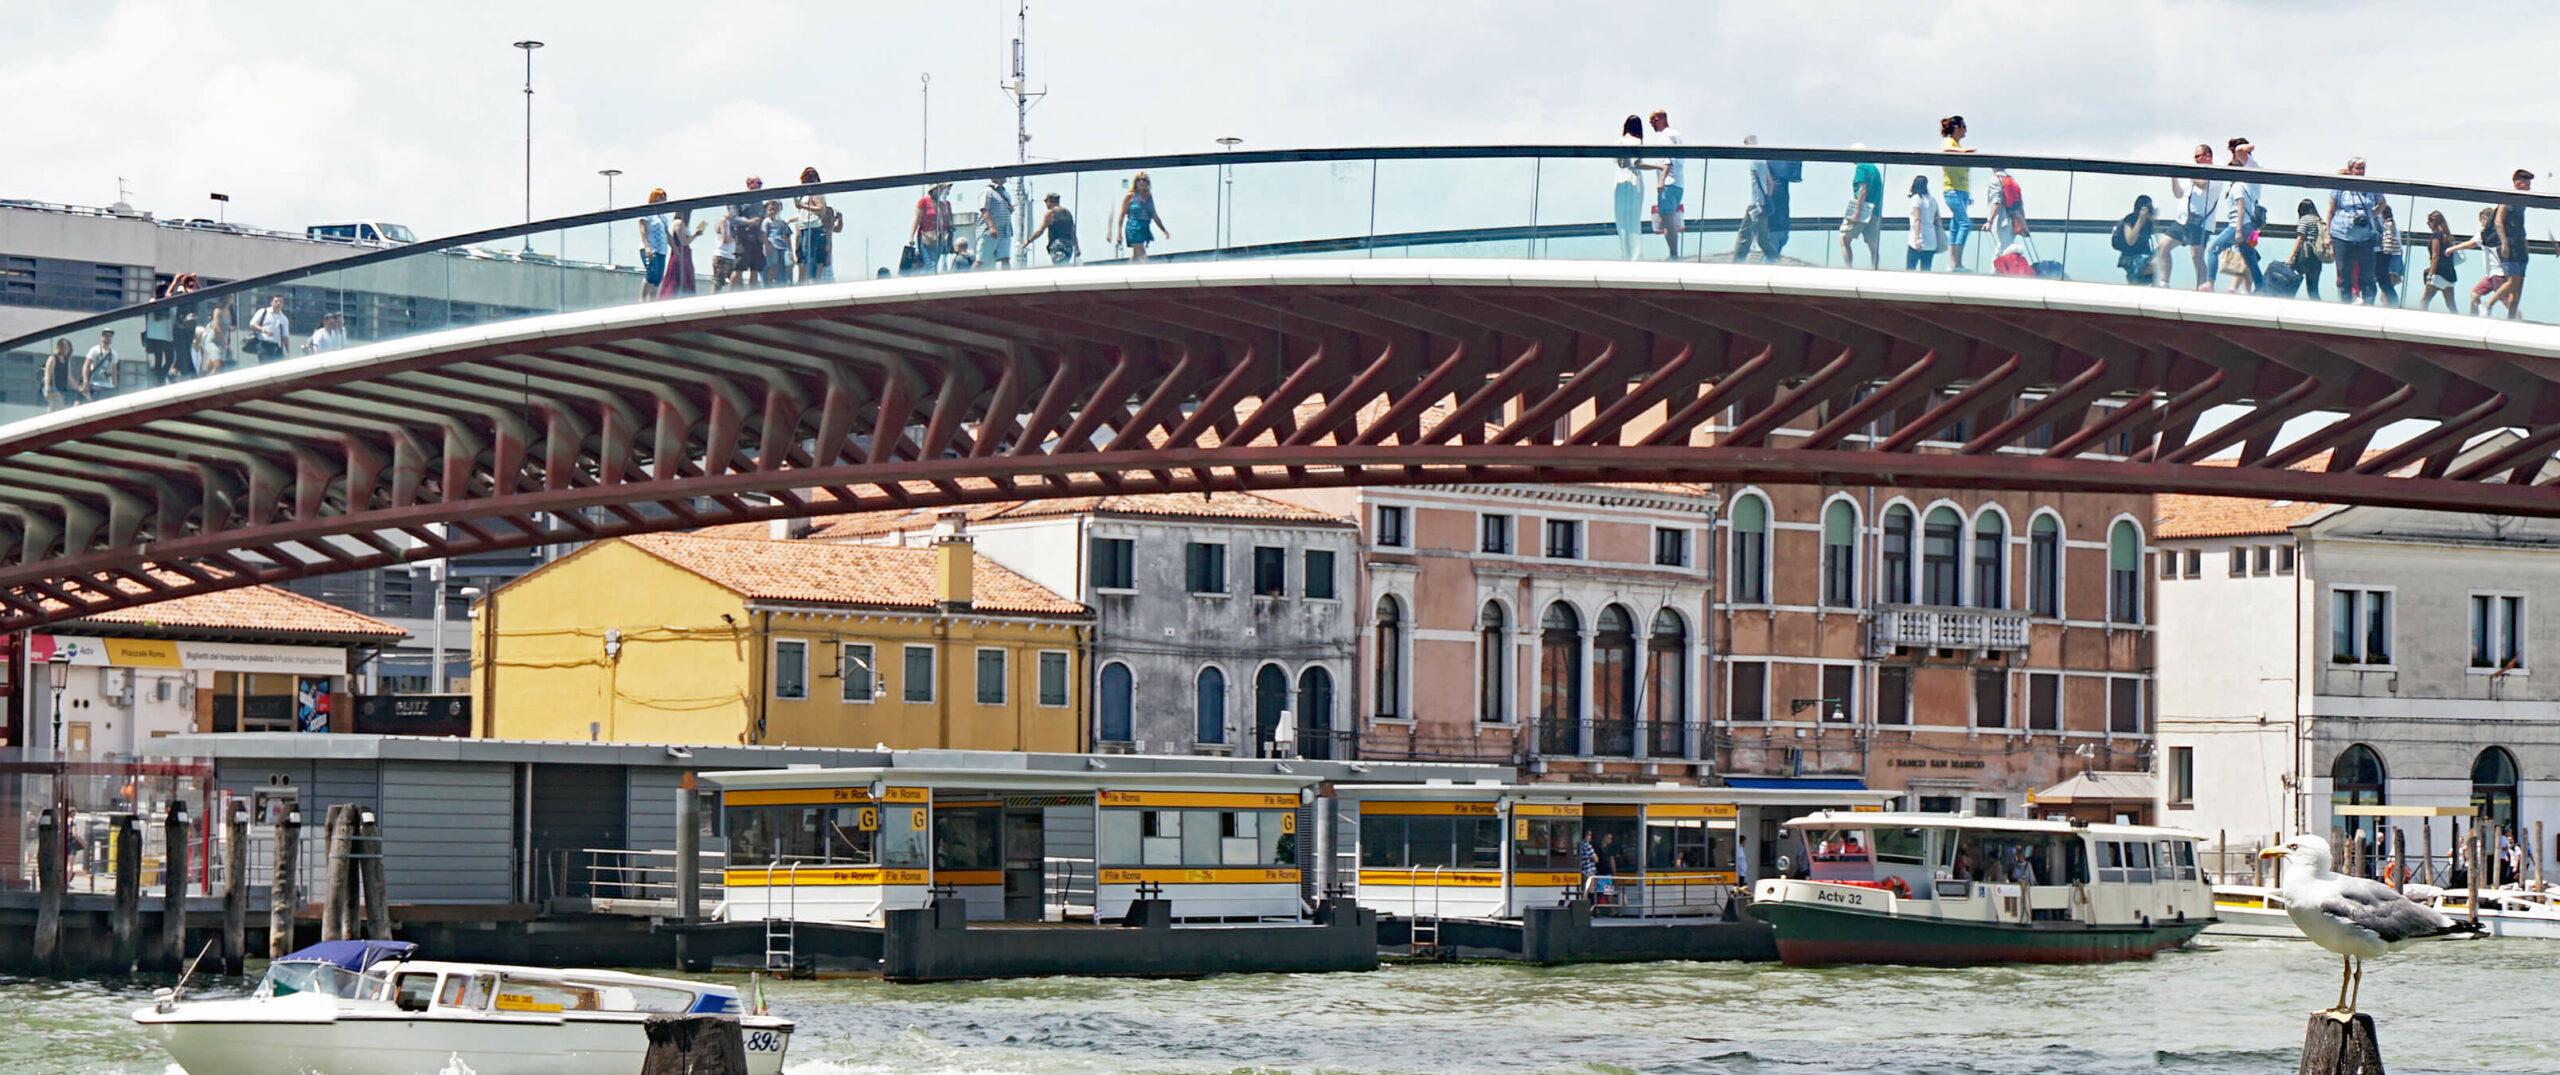 Piazzale_Roma_Venice